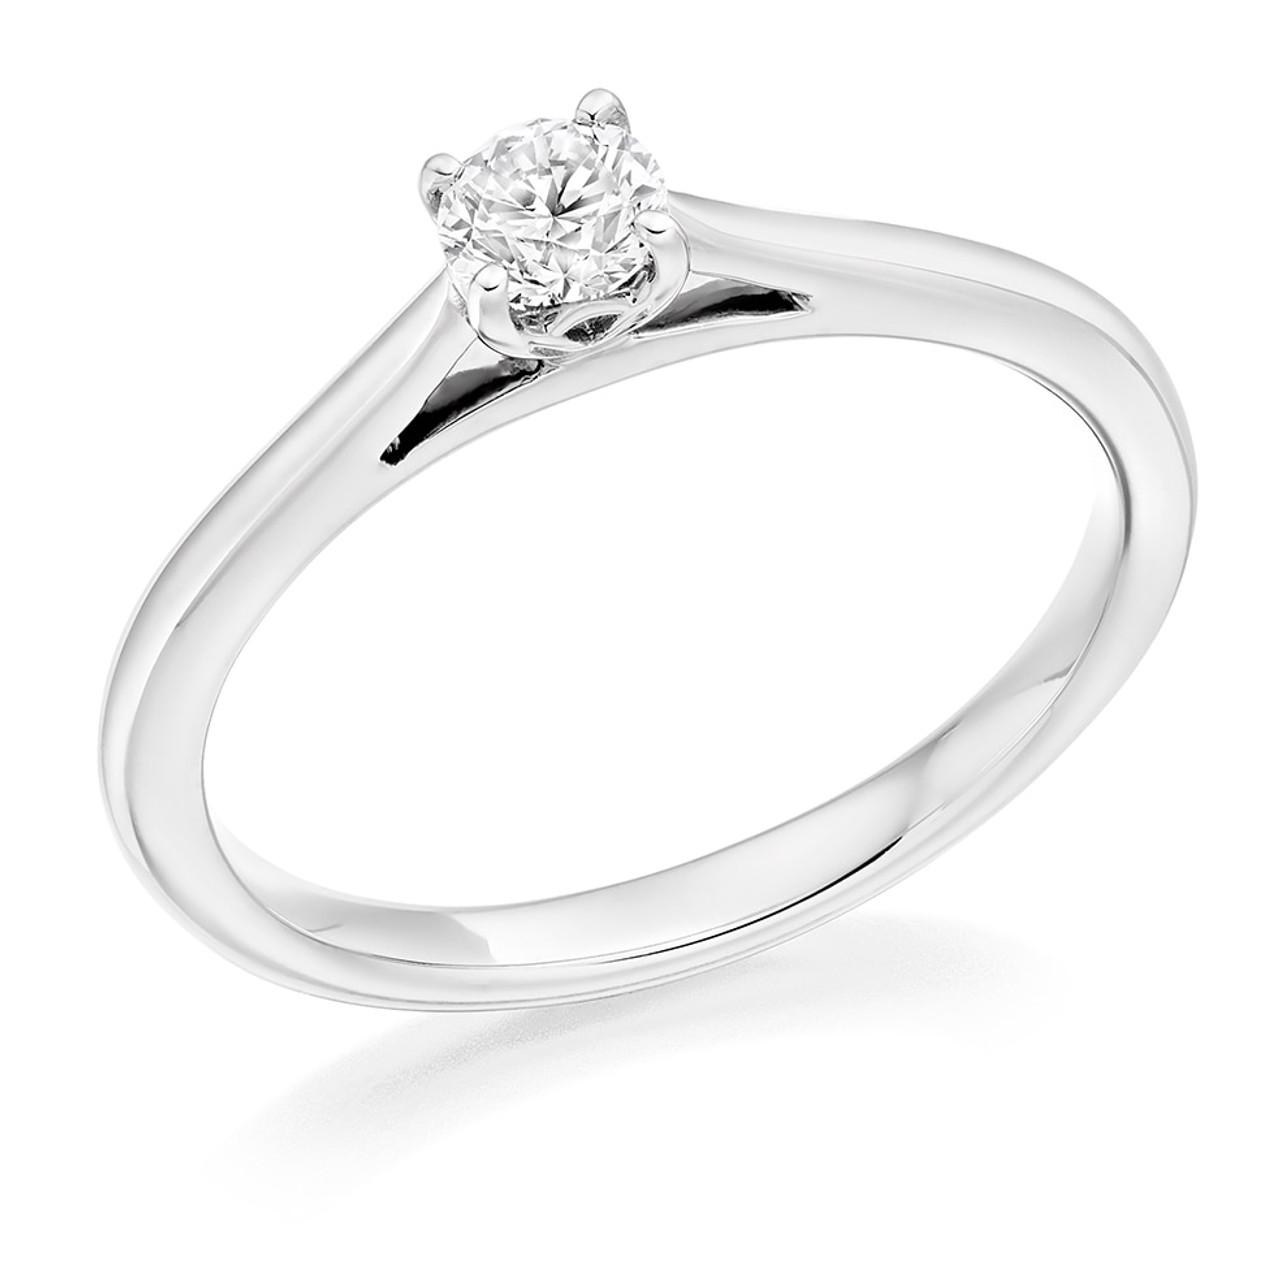 Daisy 0.25ct Diamond Engagement Ring